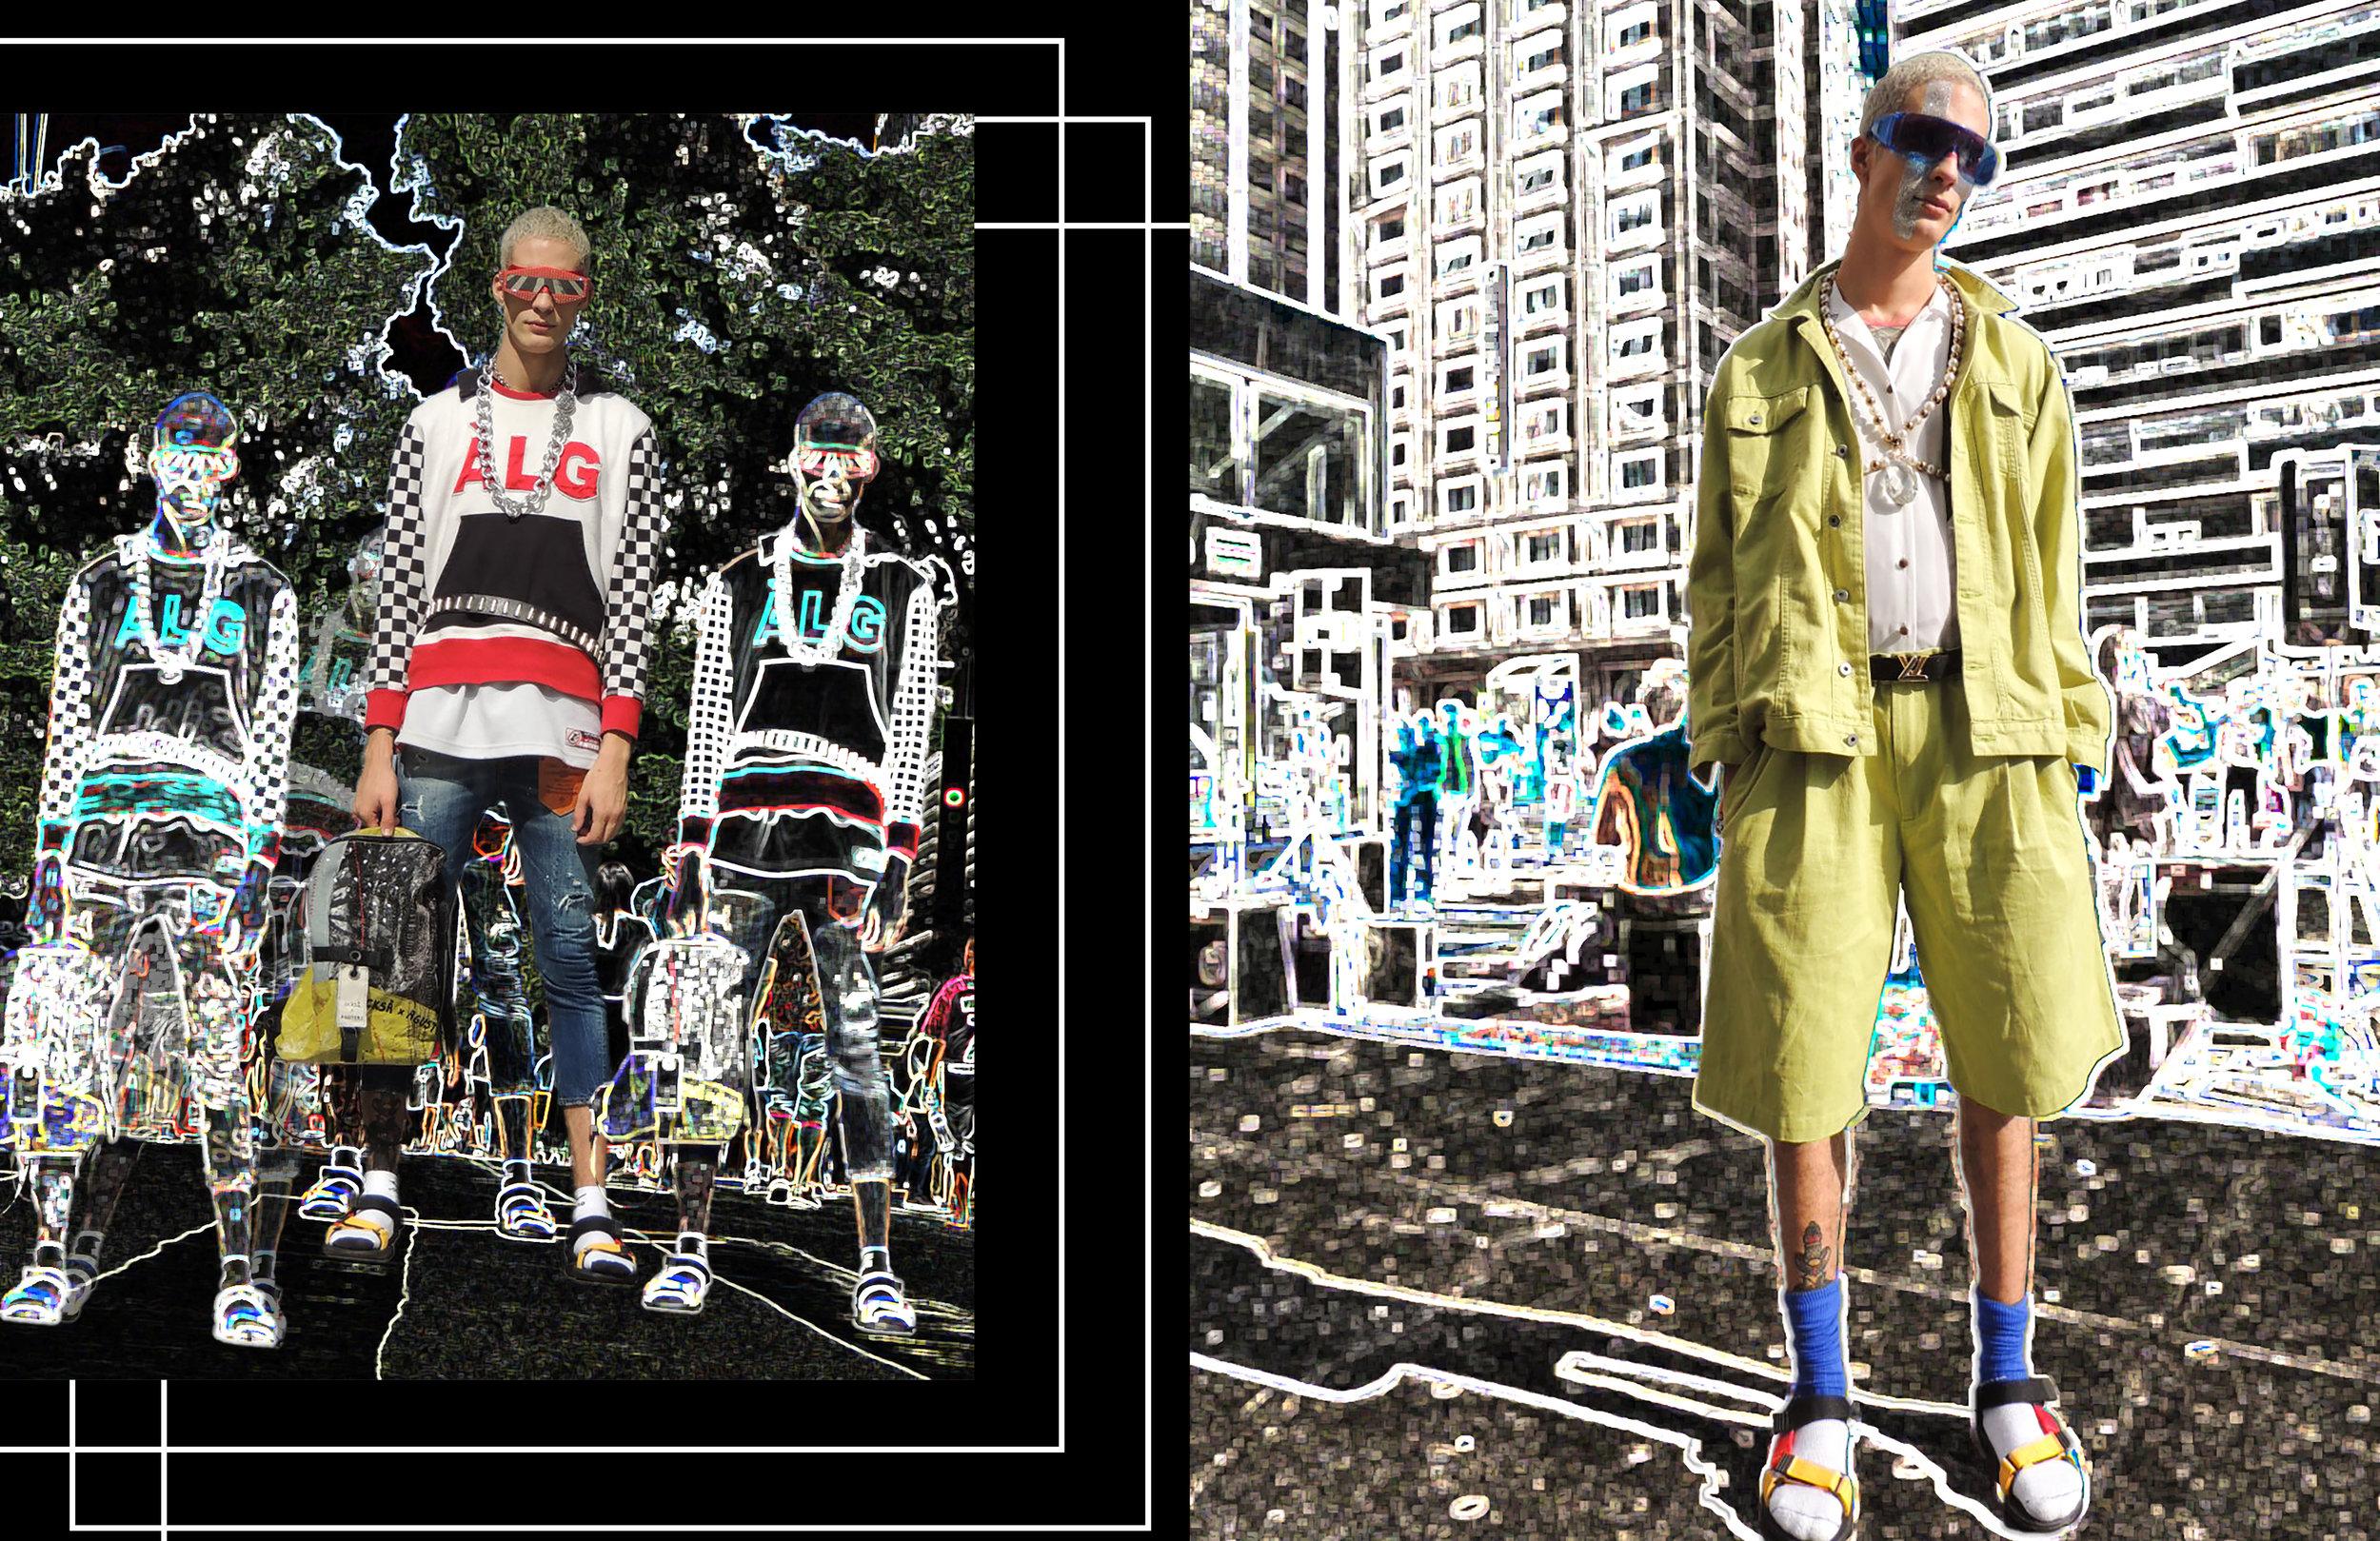 Street Superhero_layout4.jpg